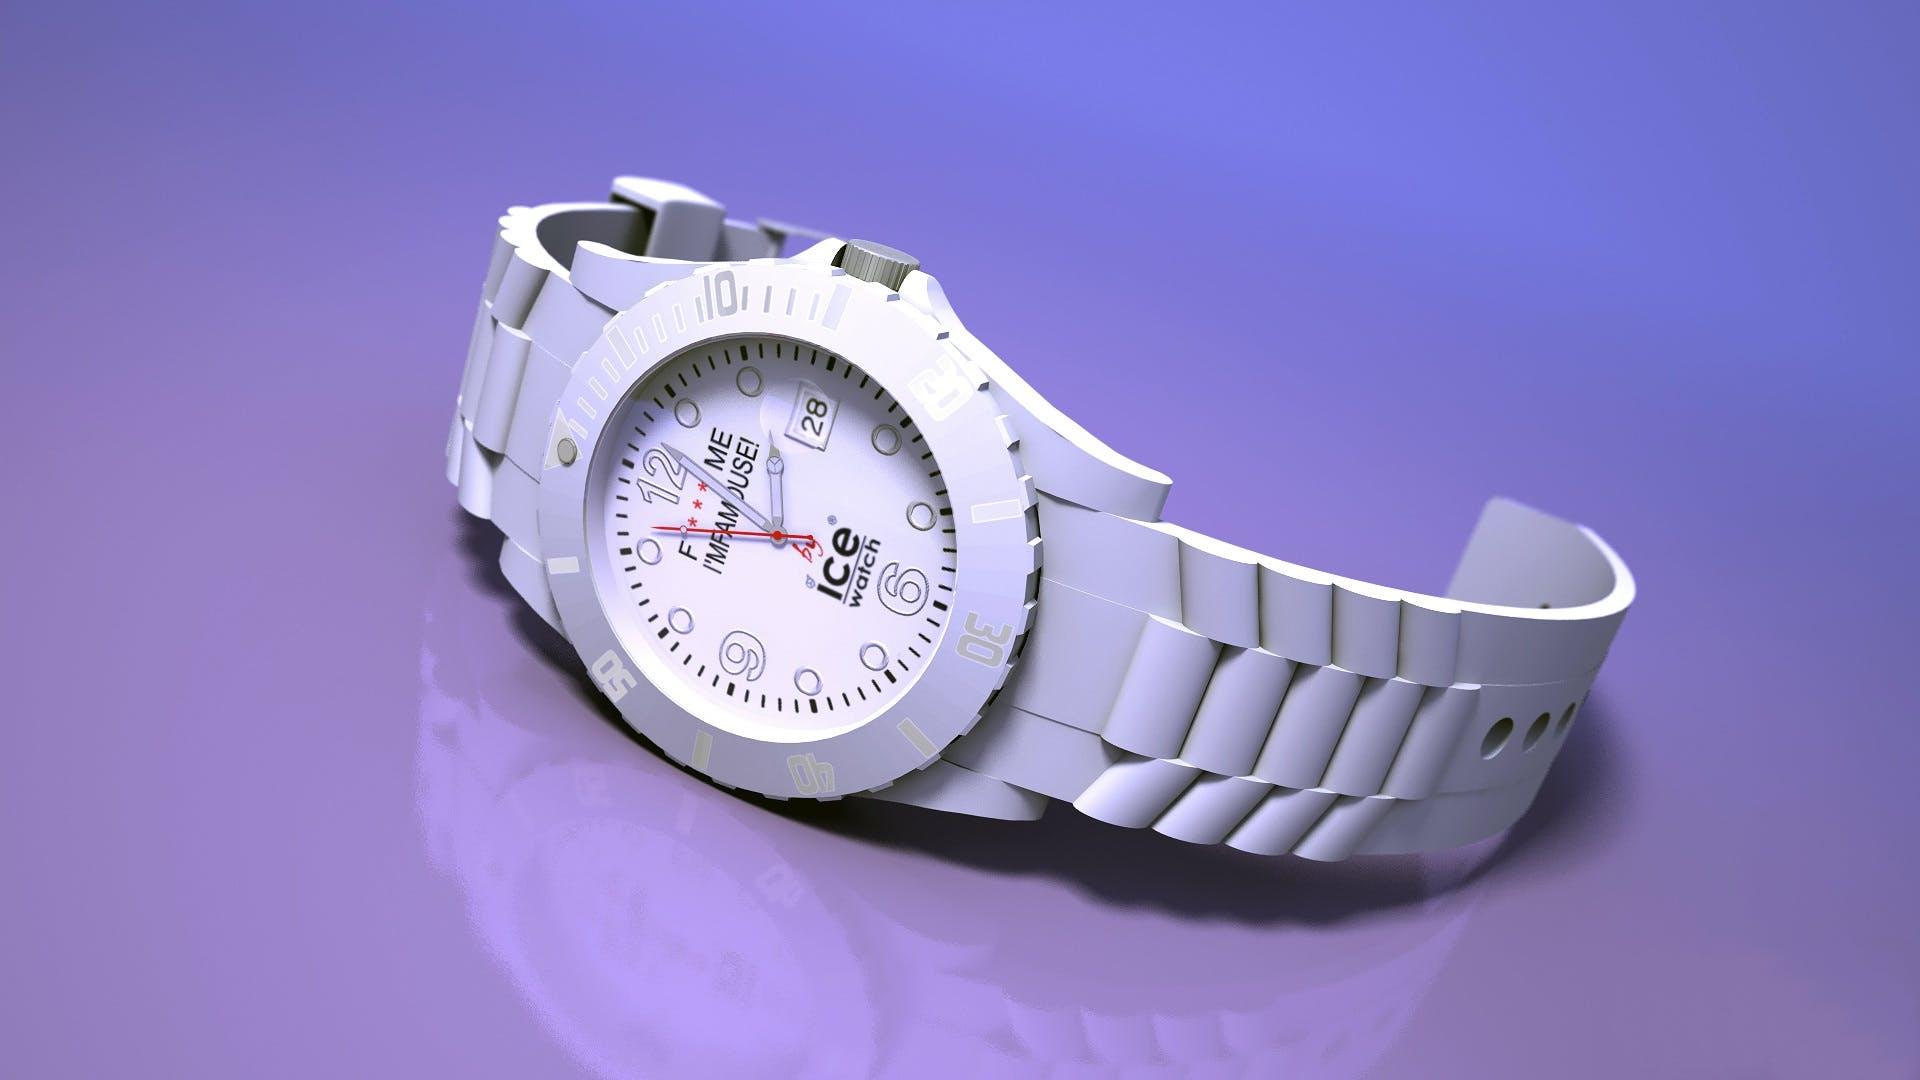 relógio de gelo, relógio de pulso, relógio de punho